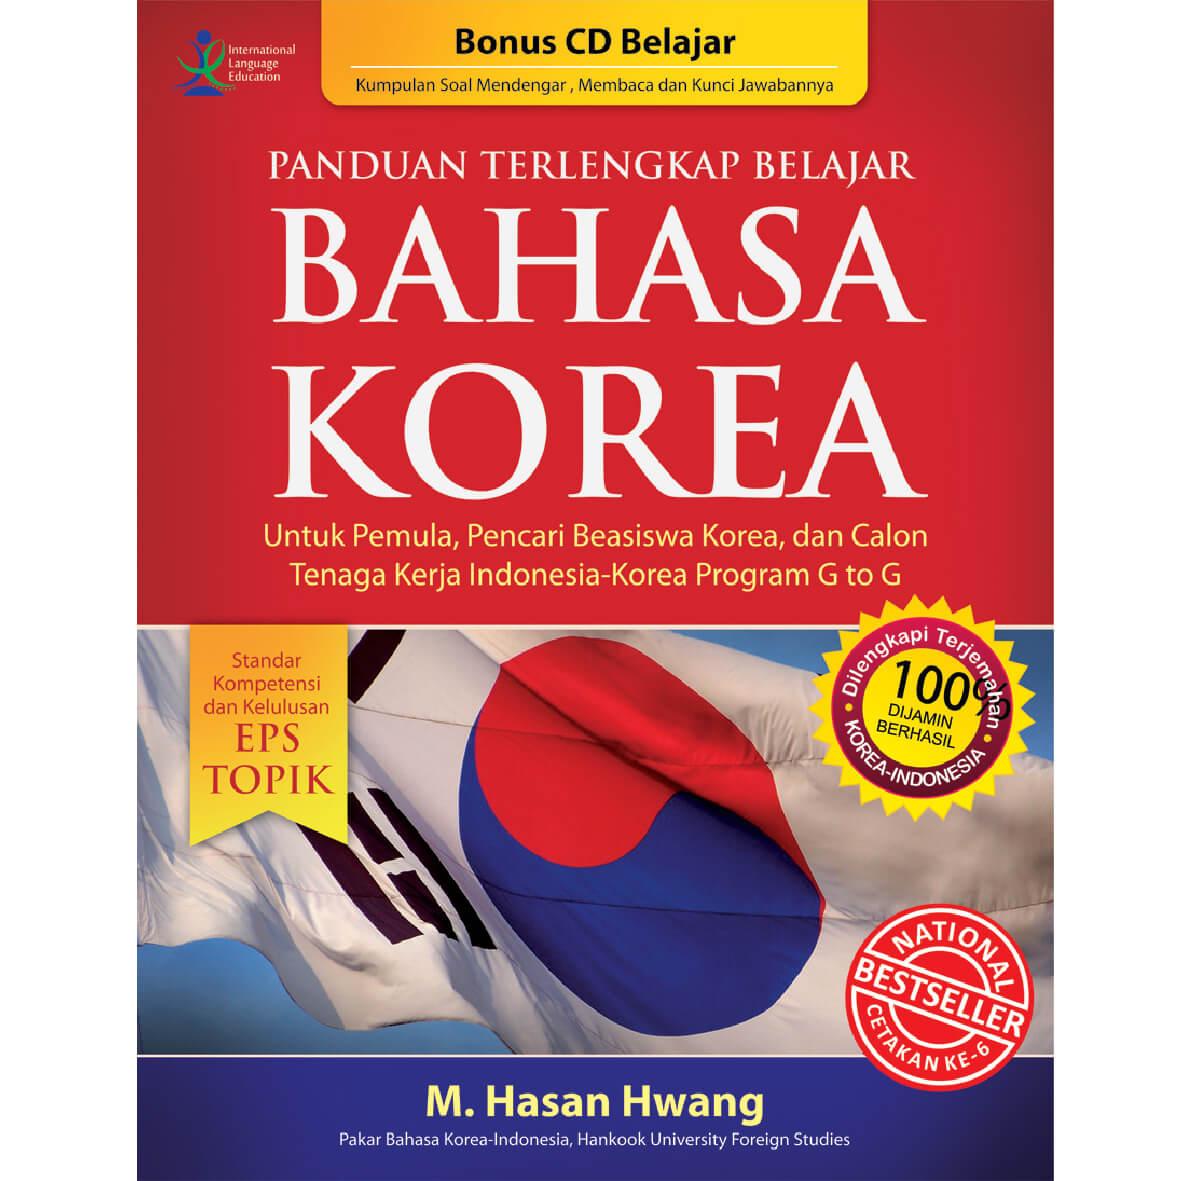 Jual Buku Belajar Bahasa Korea Buku Langka Tokopedia